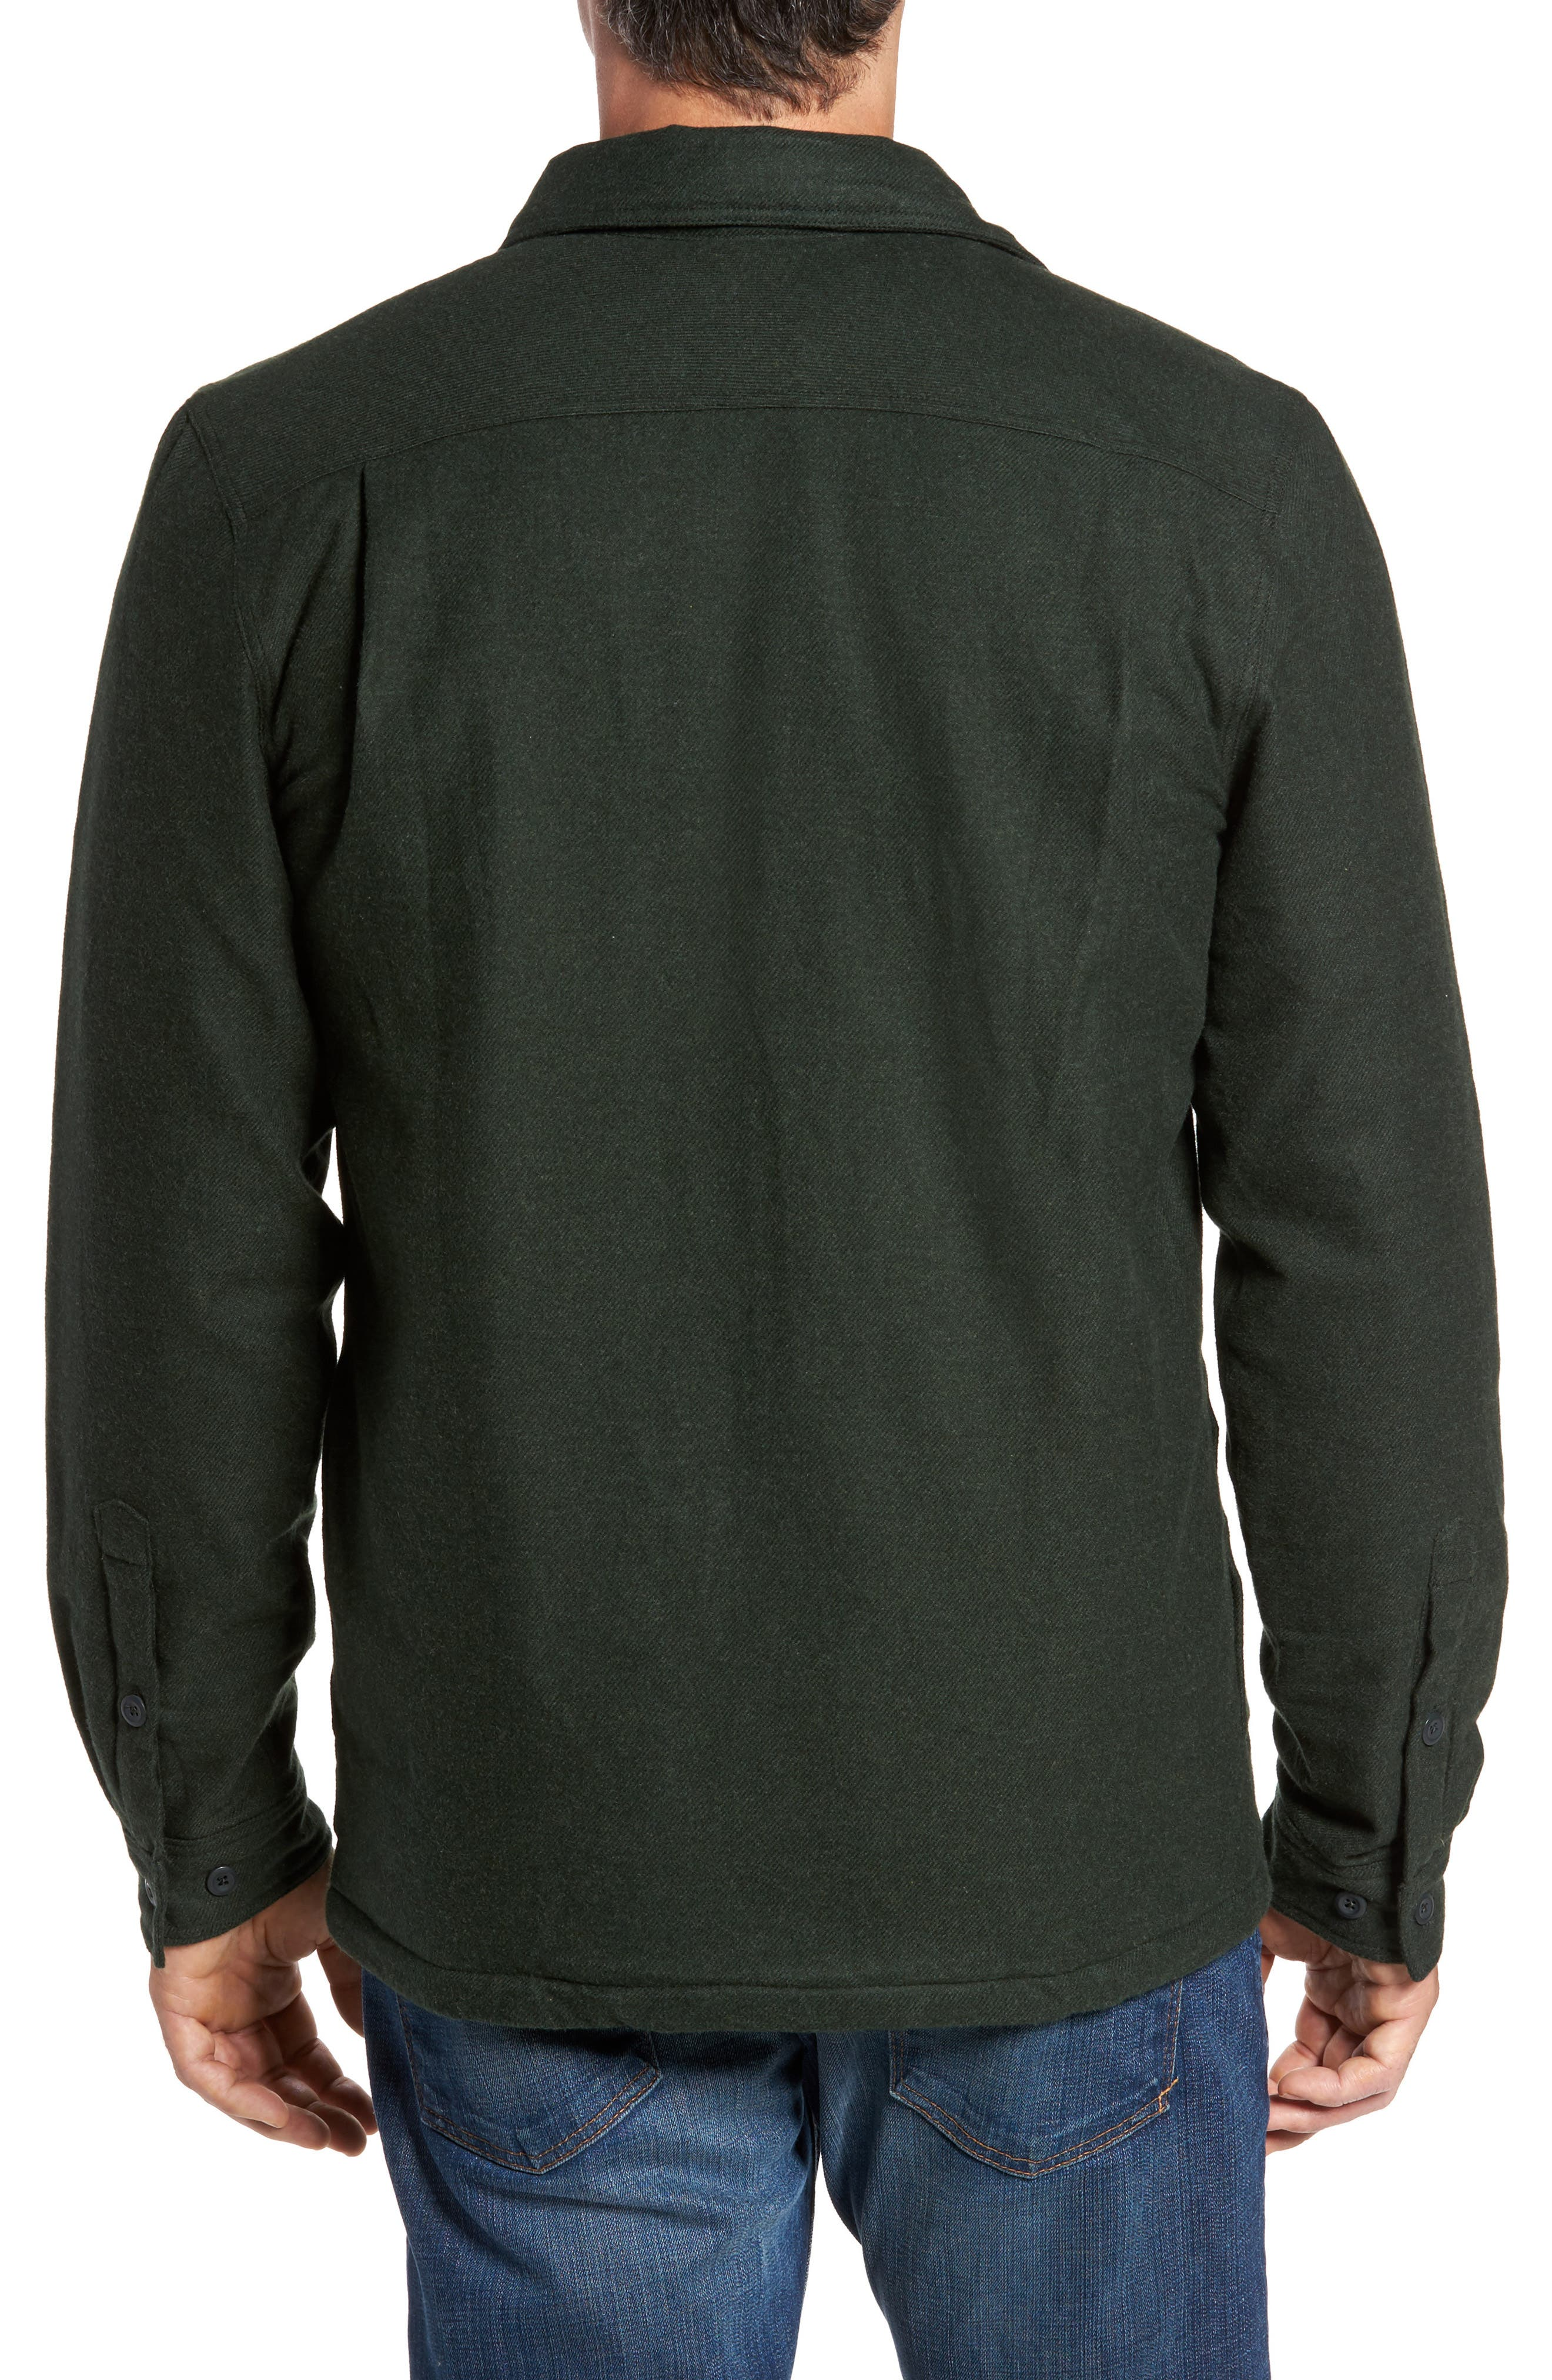 'Fjord' Flannel Shirt Jacket,                             Alternate thumbnail 2, color,                             002